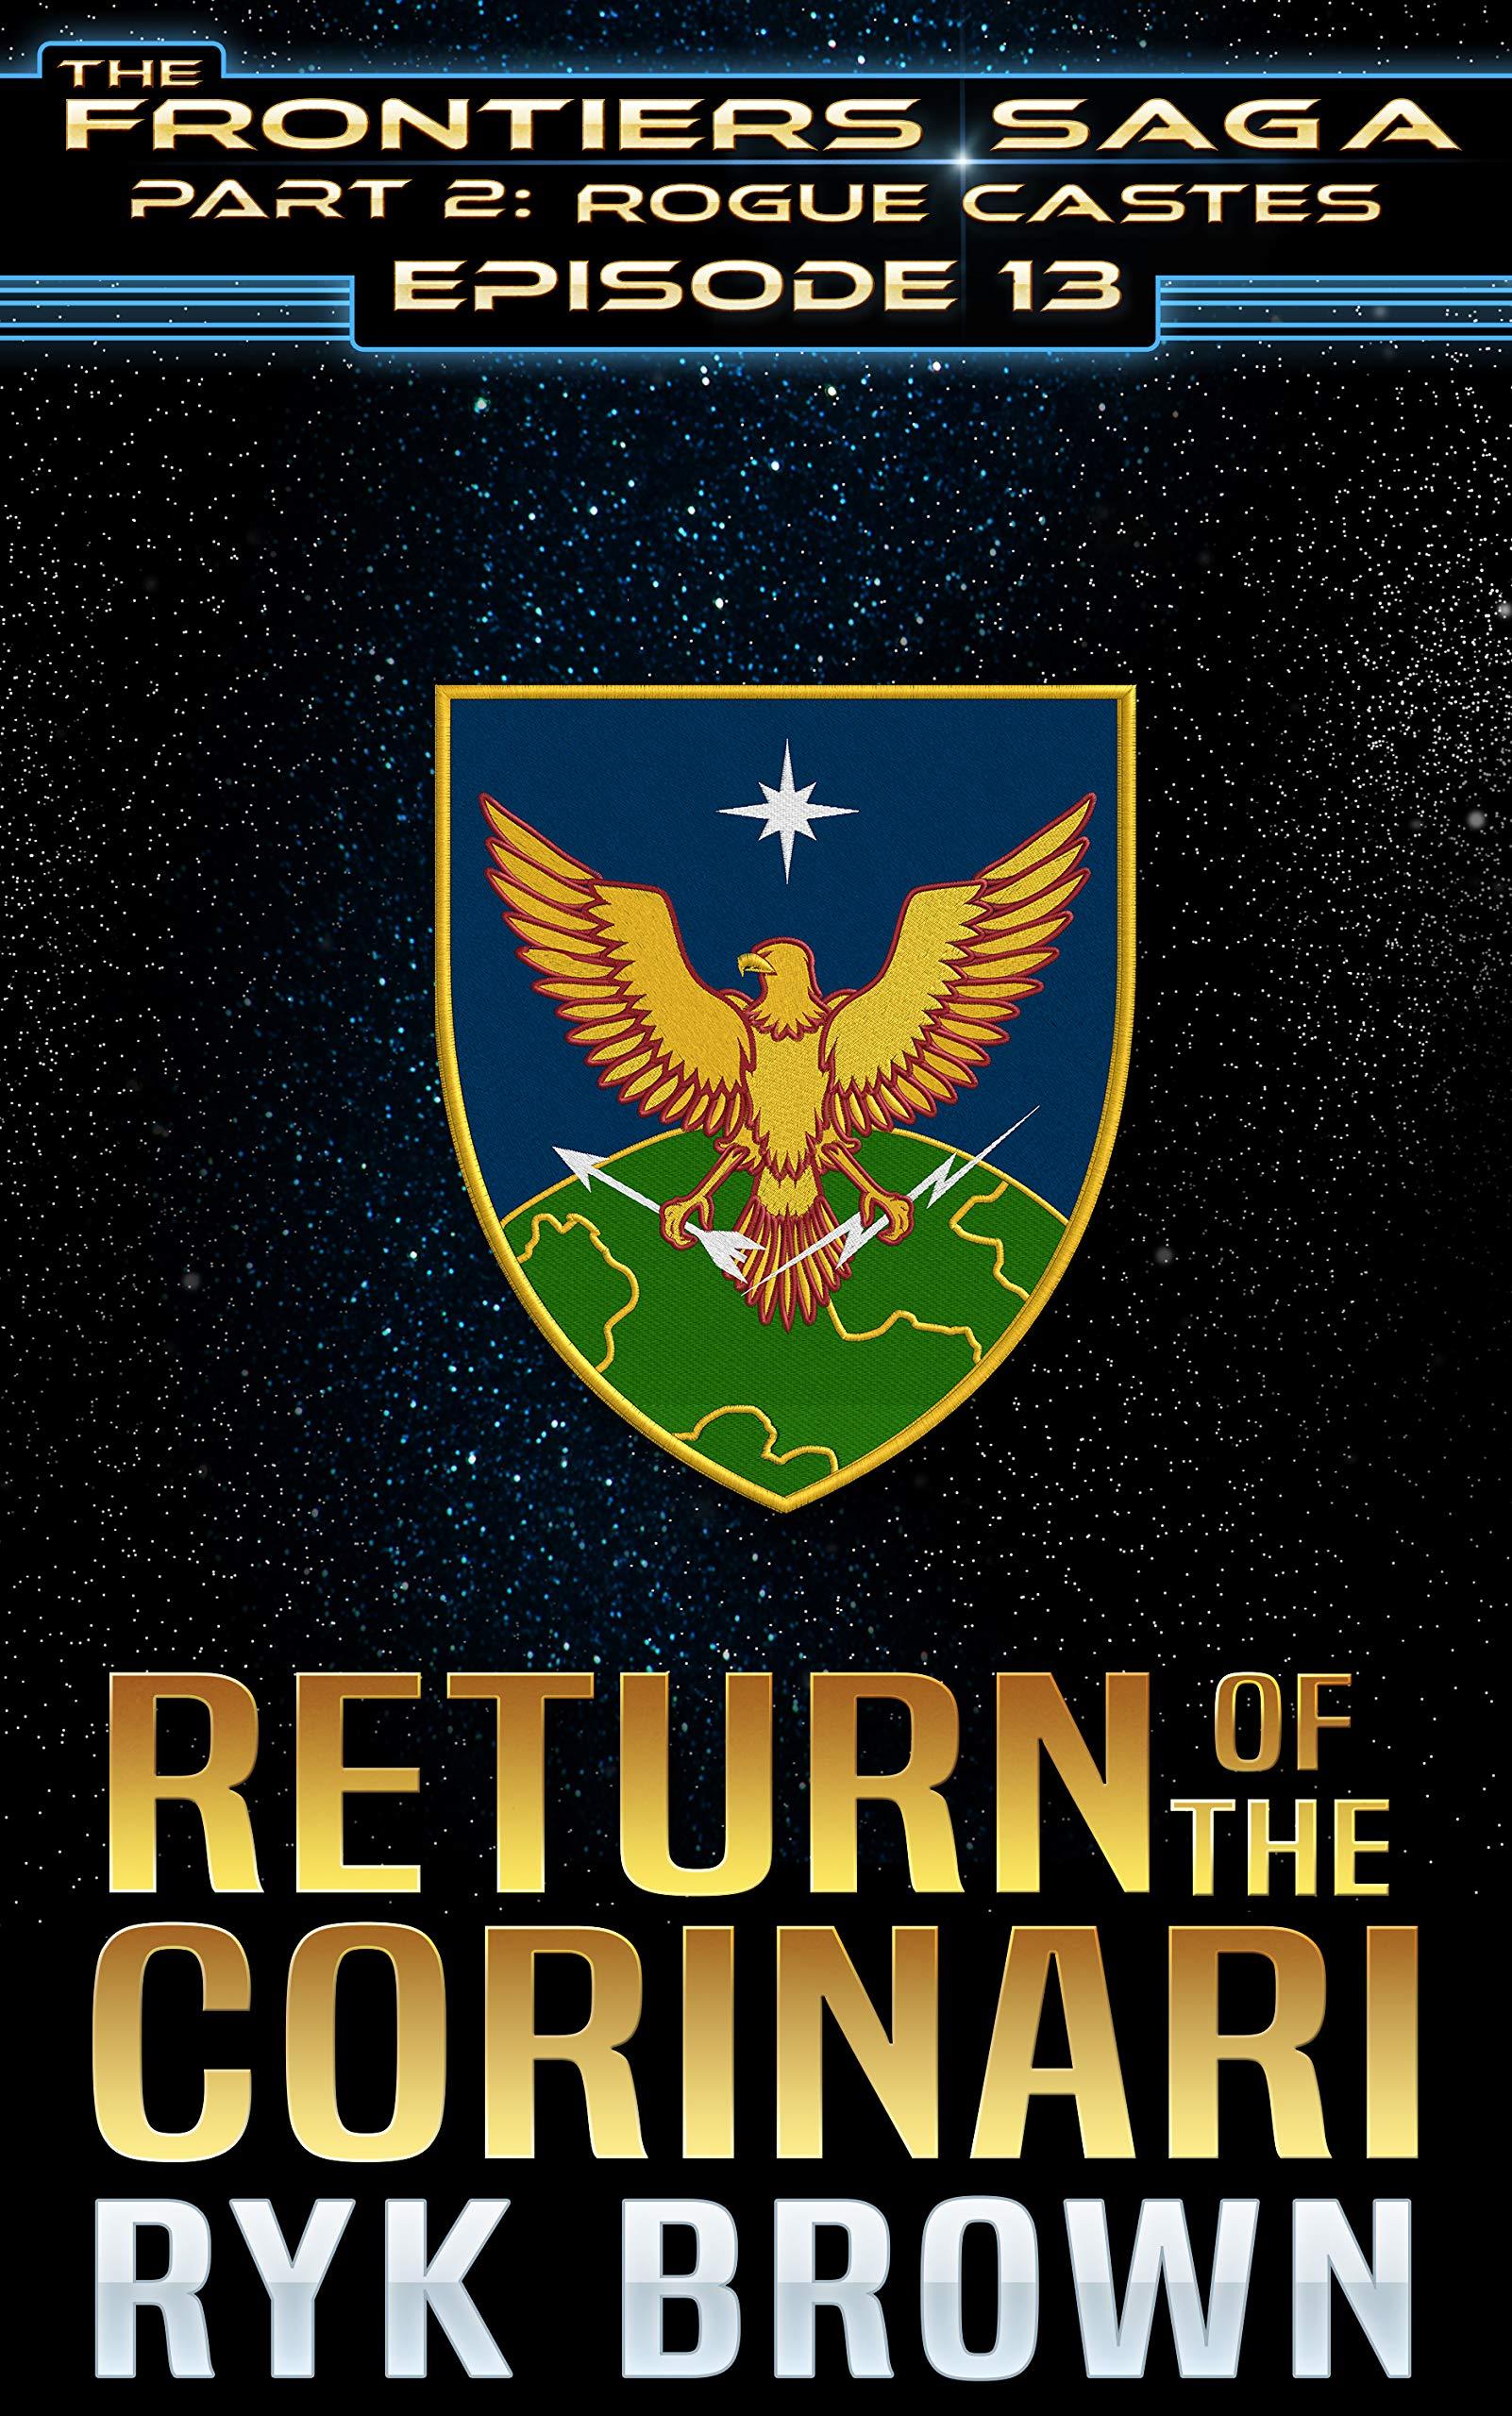 Ep. 13   'Return Of The Corinari'  The Frontiers Saga   Part 2  Rogue Castes   English Edition